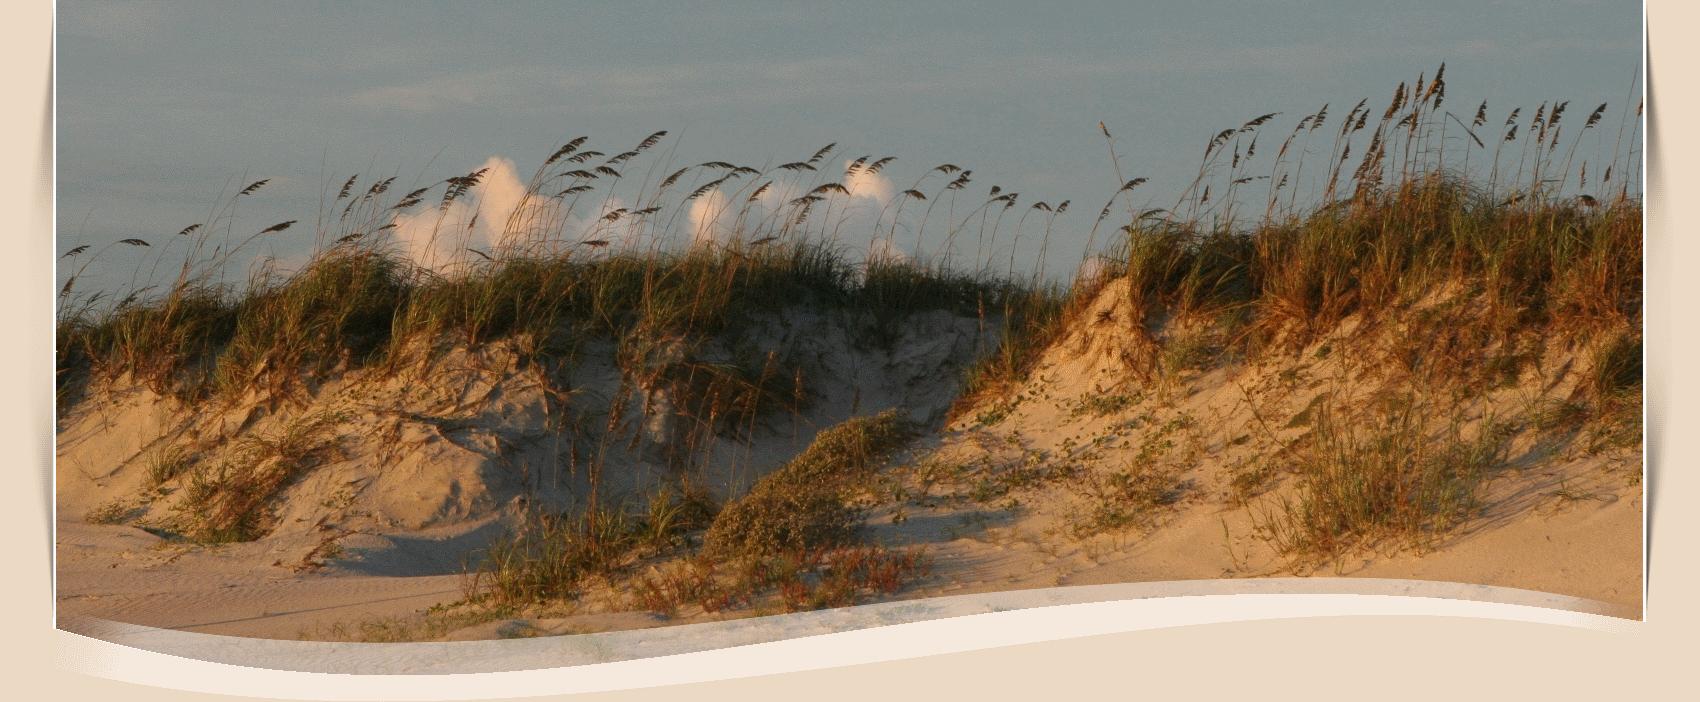 Beach Information | New Smyrna Beach, FL - Official Website